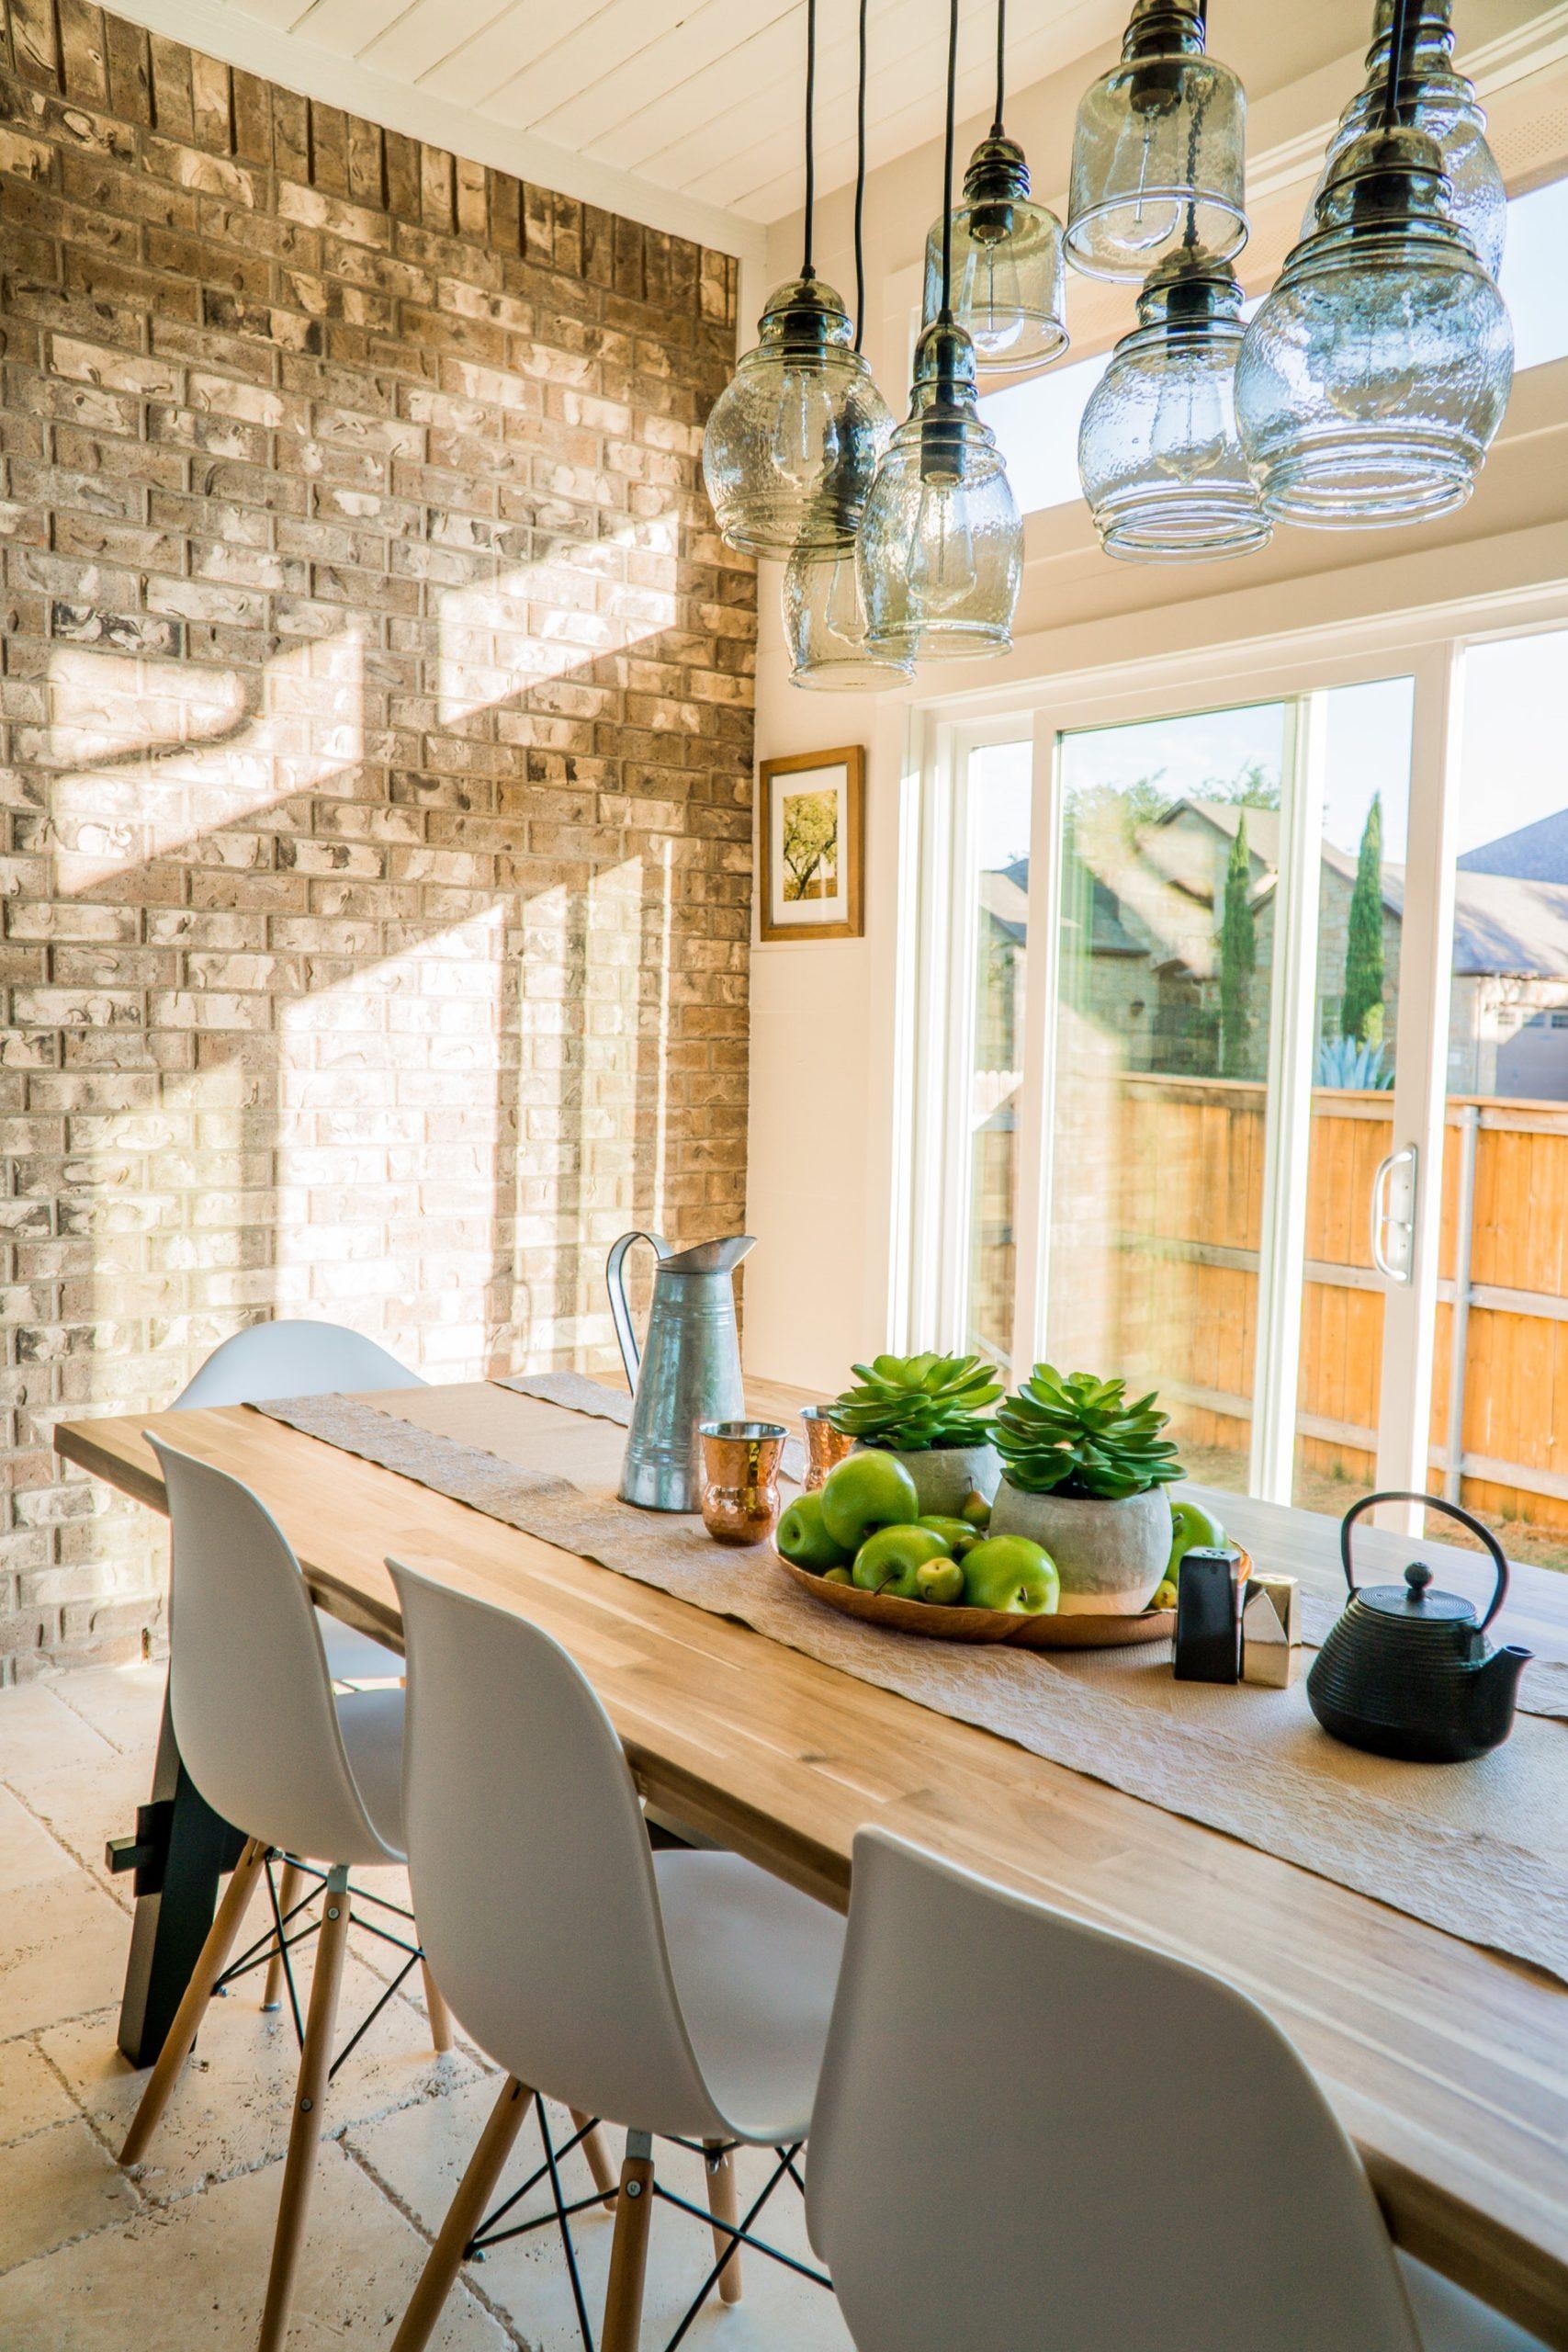 Ideas for a Home Refurbishment